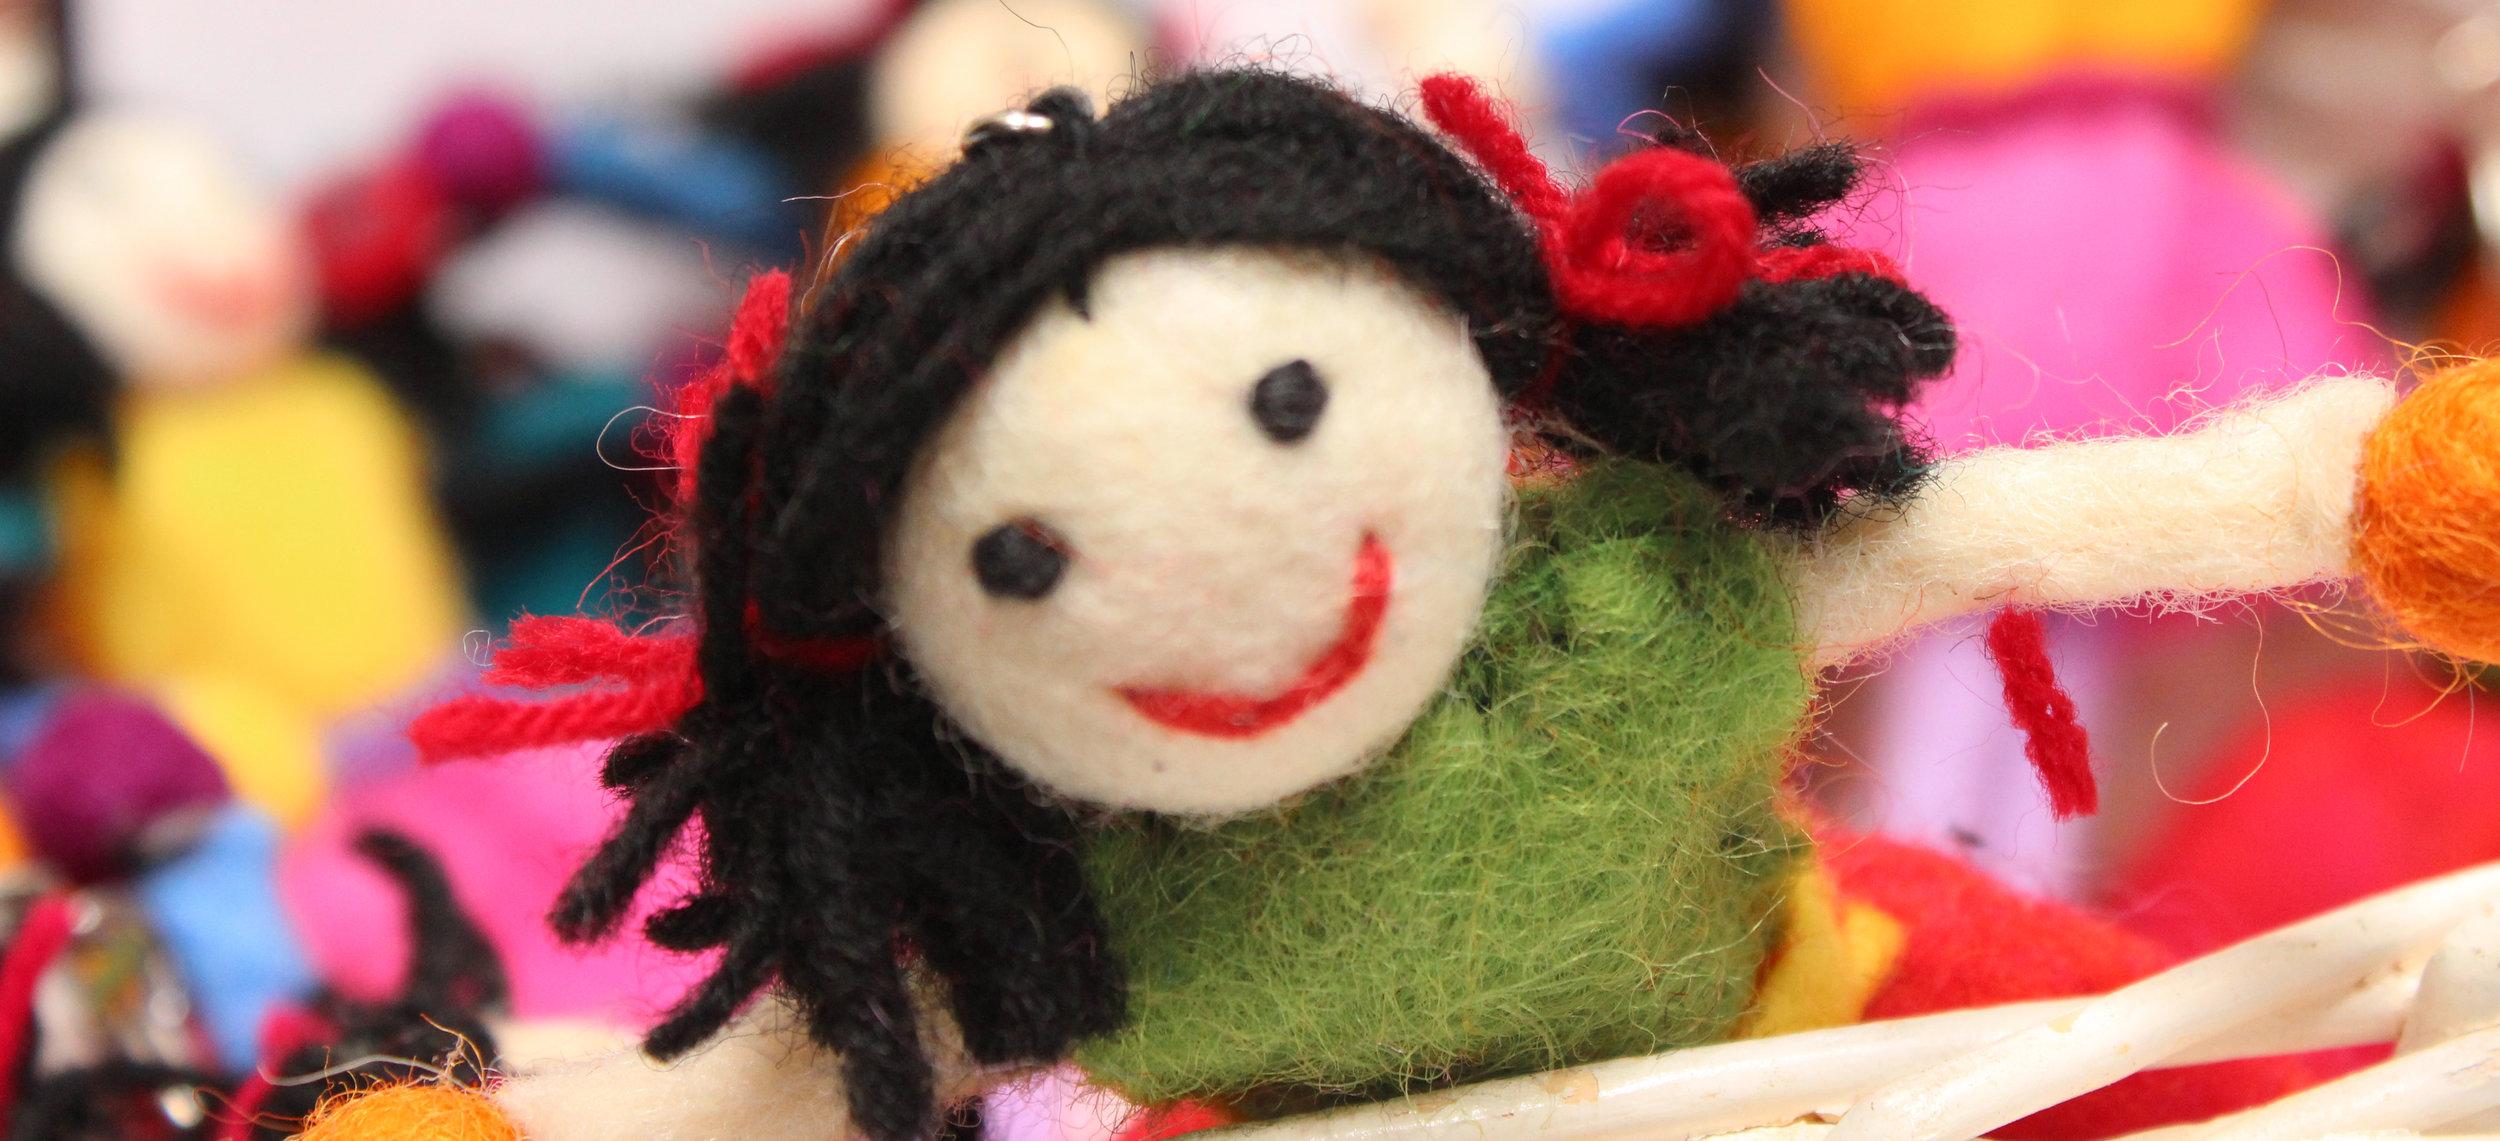 Didi doll